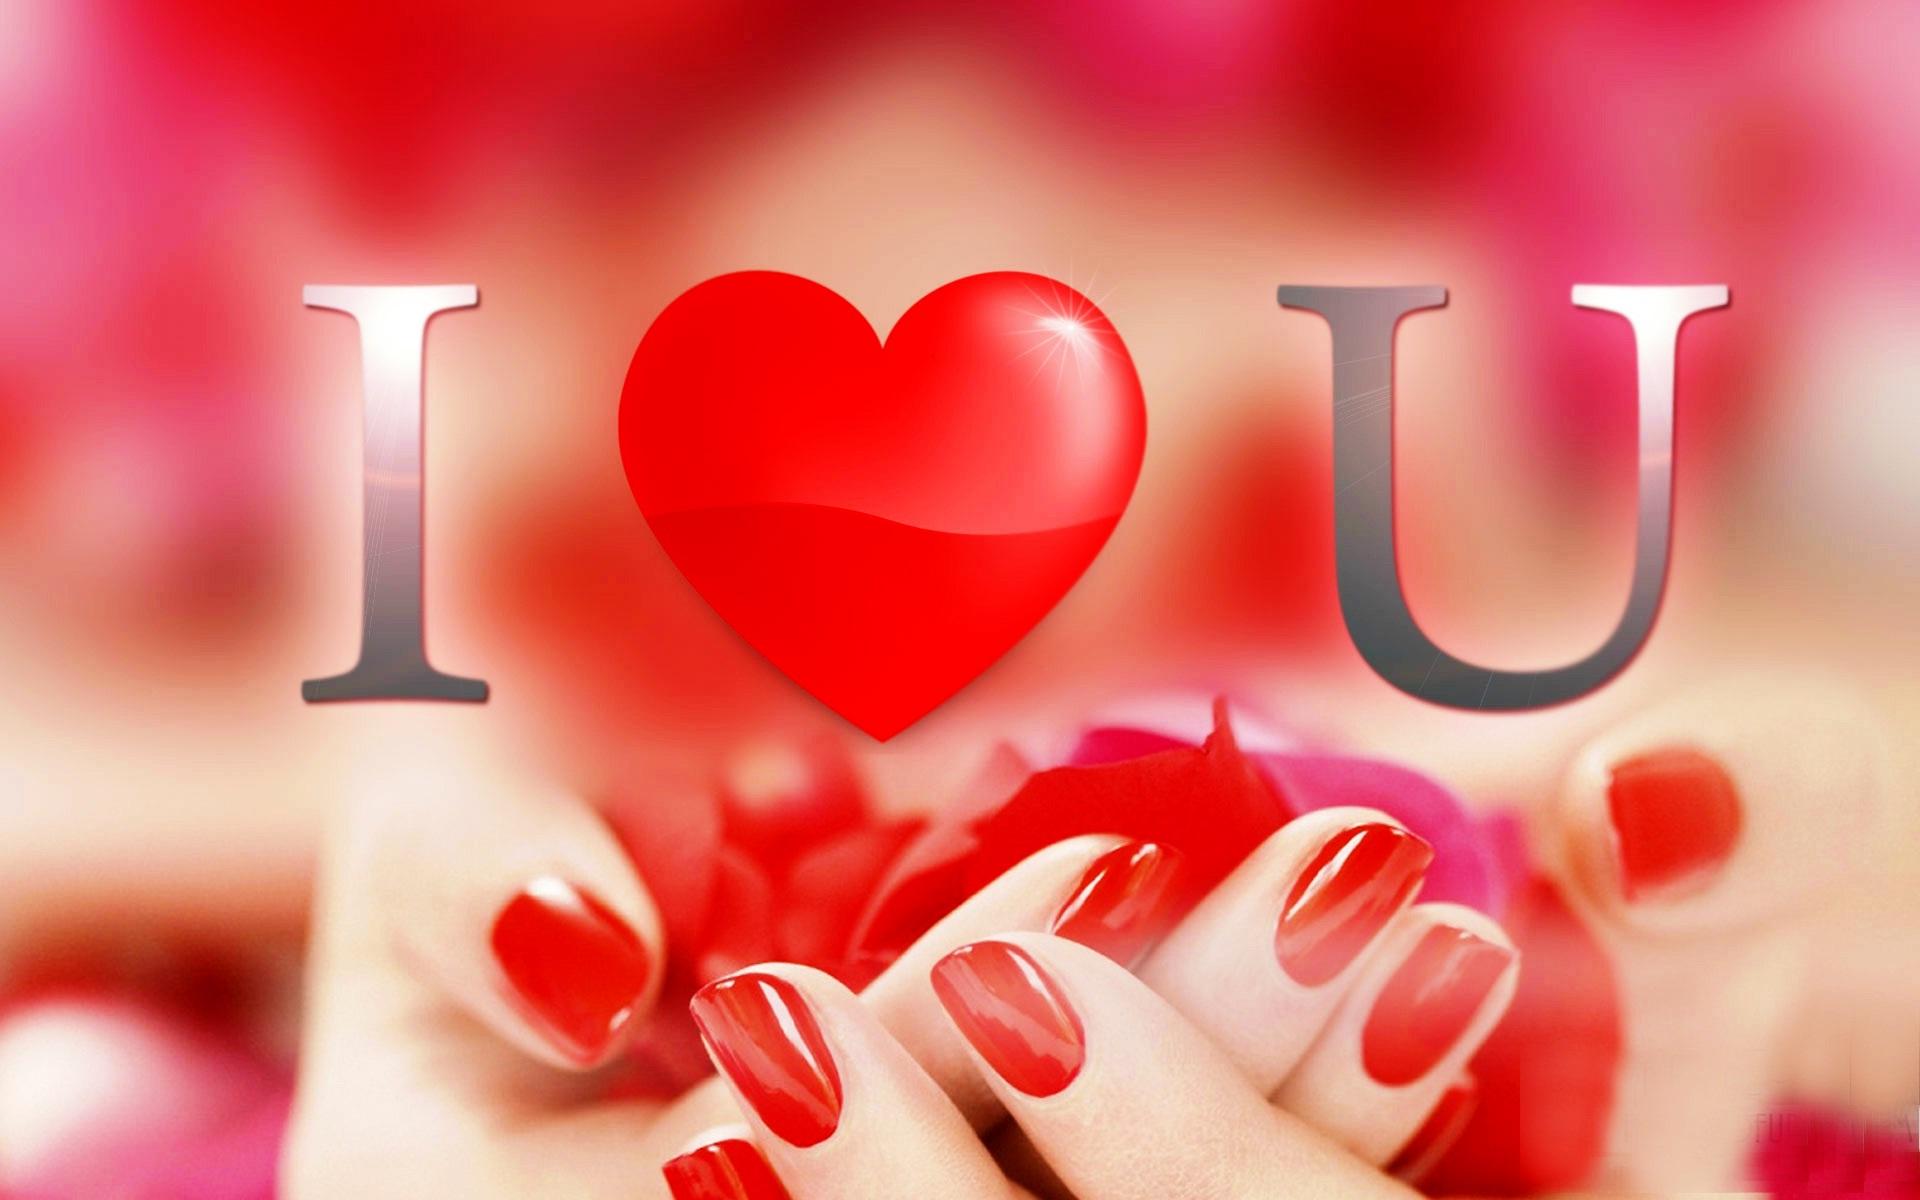 بالصور صور قلوب حب , اجمل صور قلوب للاحبه 4131 15